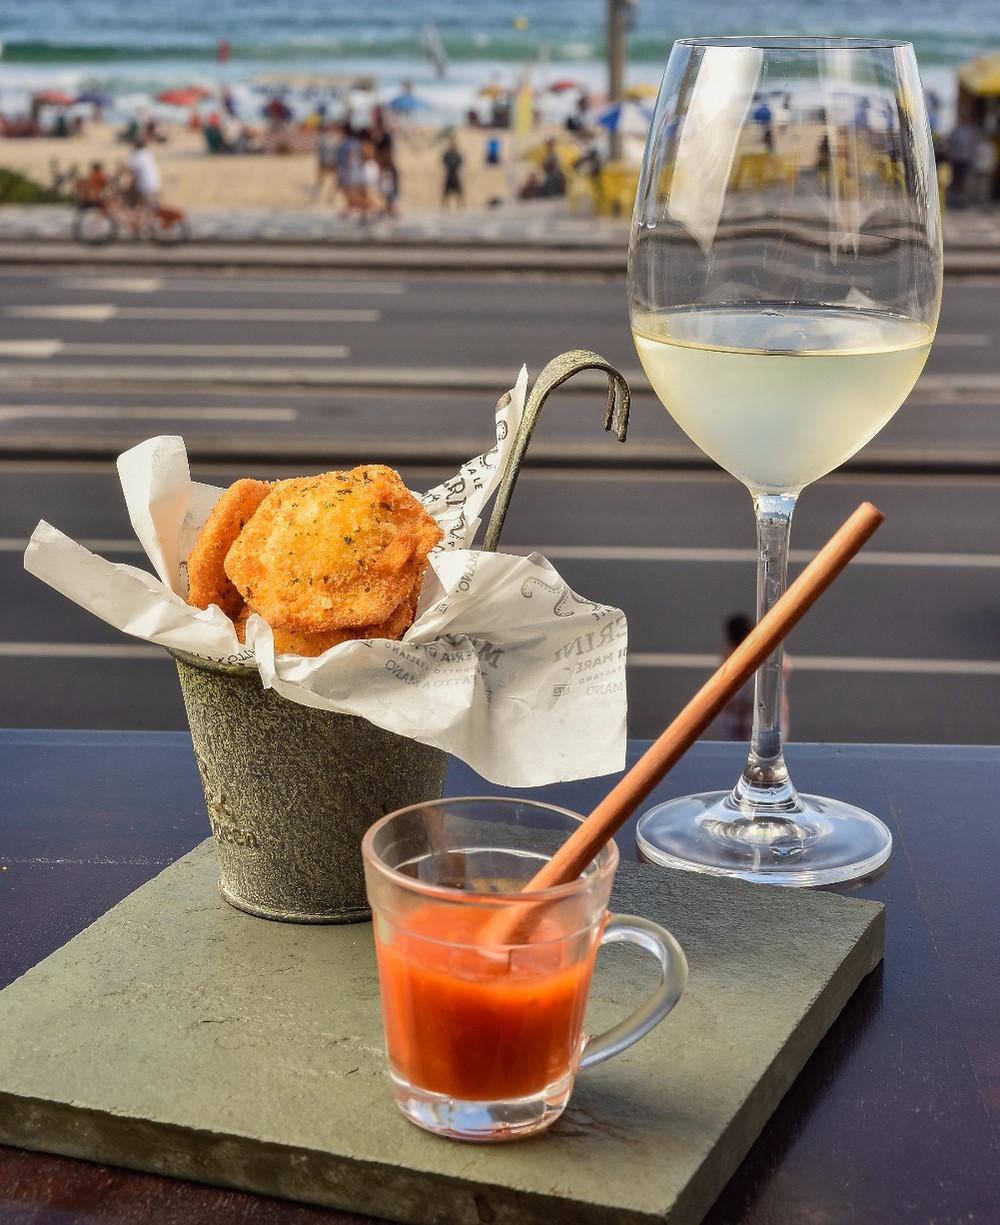 Melhores restaurantes novos Masserini Osteria di Mare Ipanema Sol Ipanema